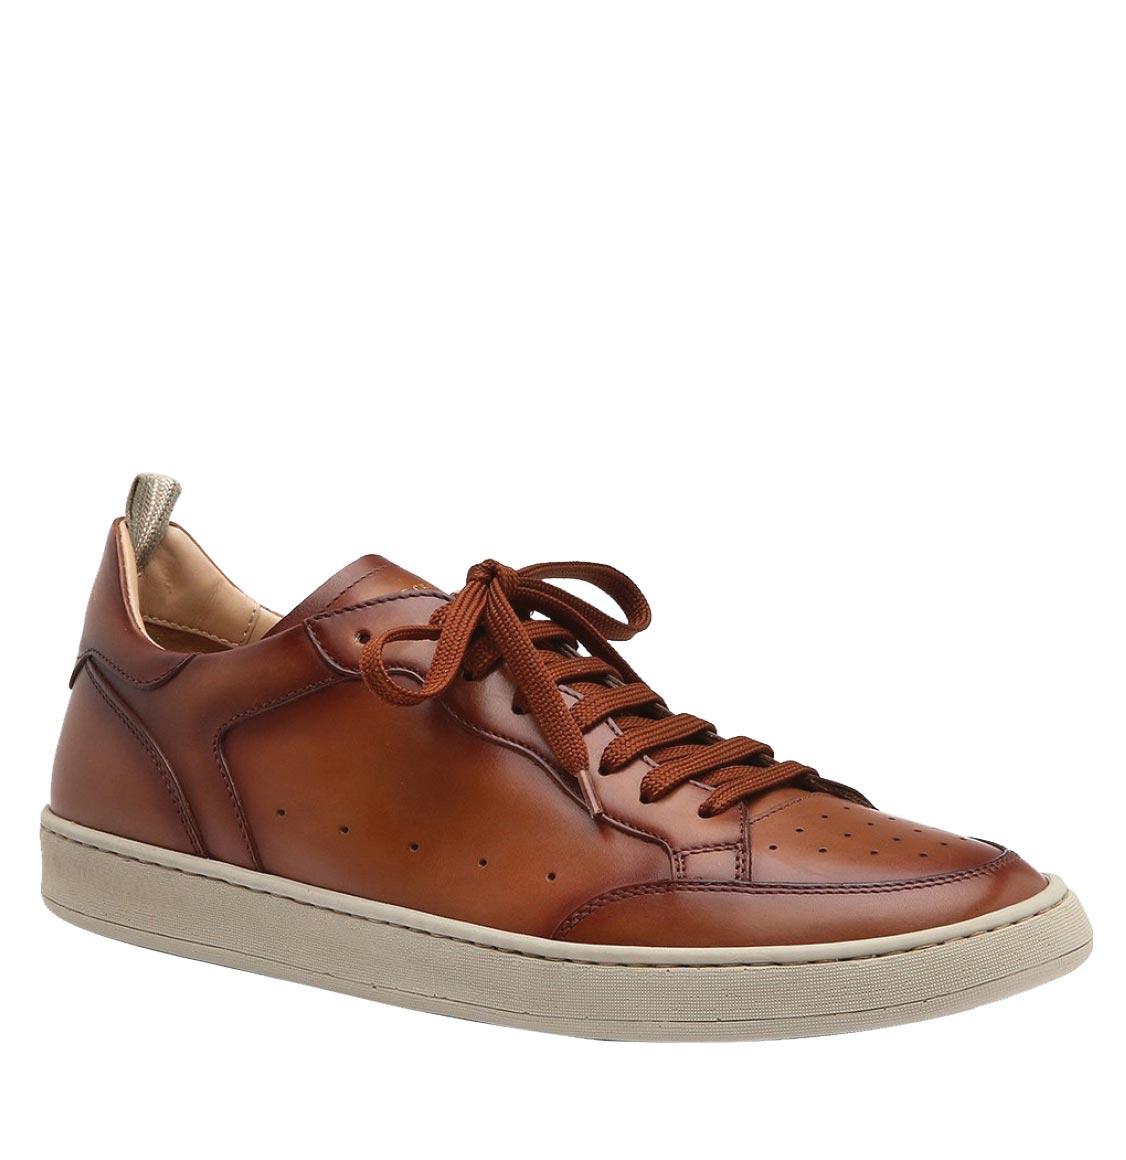 Officine Creative Kareem Lux Tan Leather Sneakers